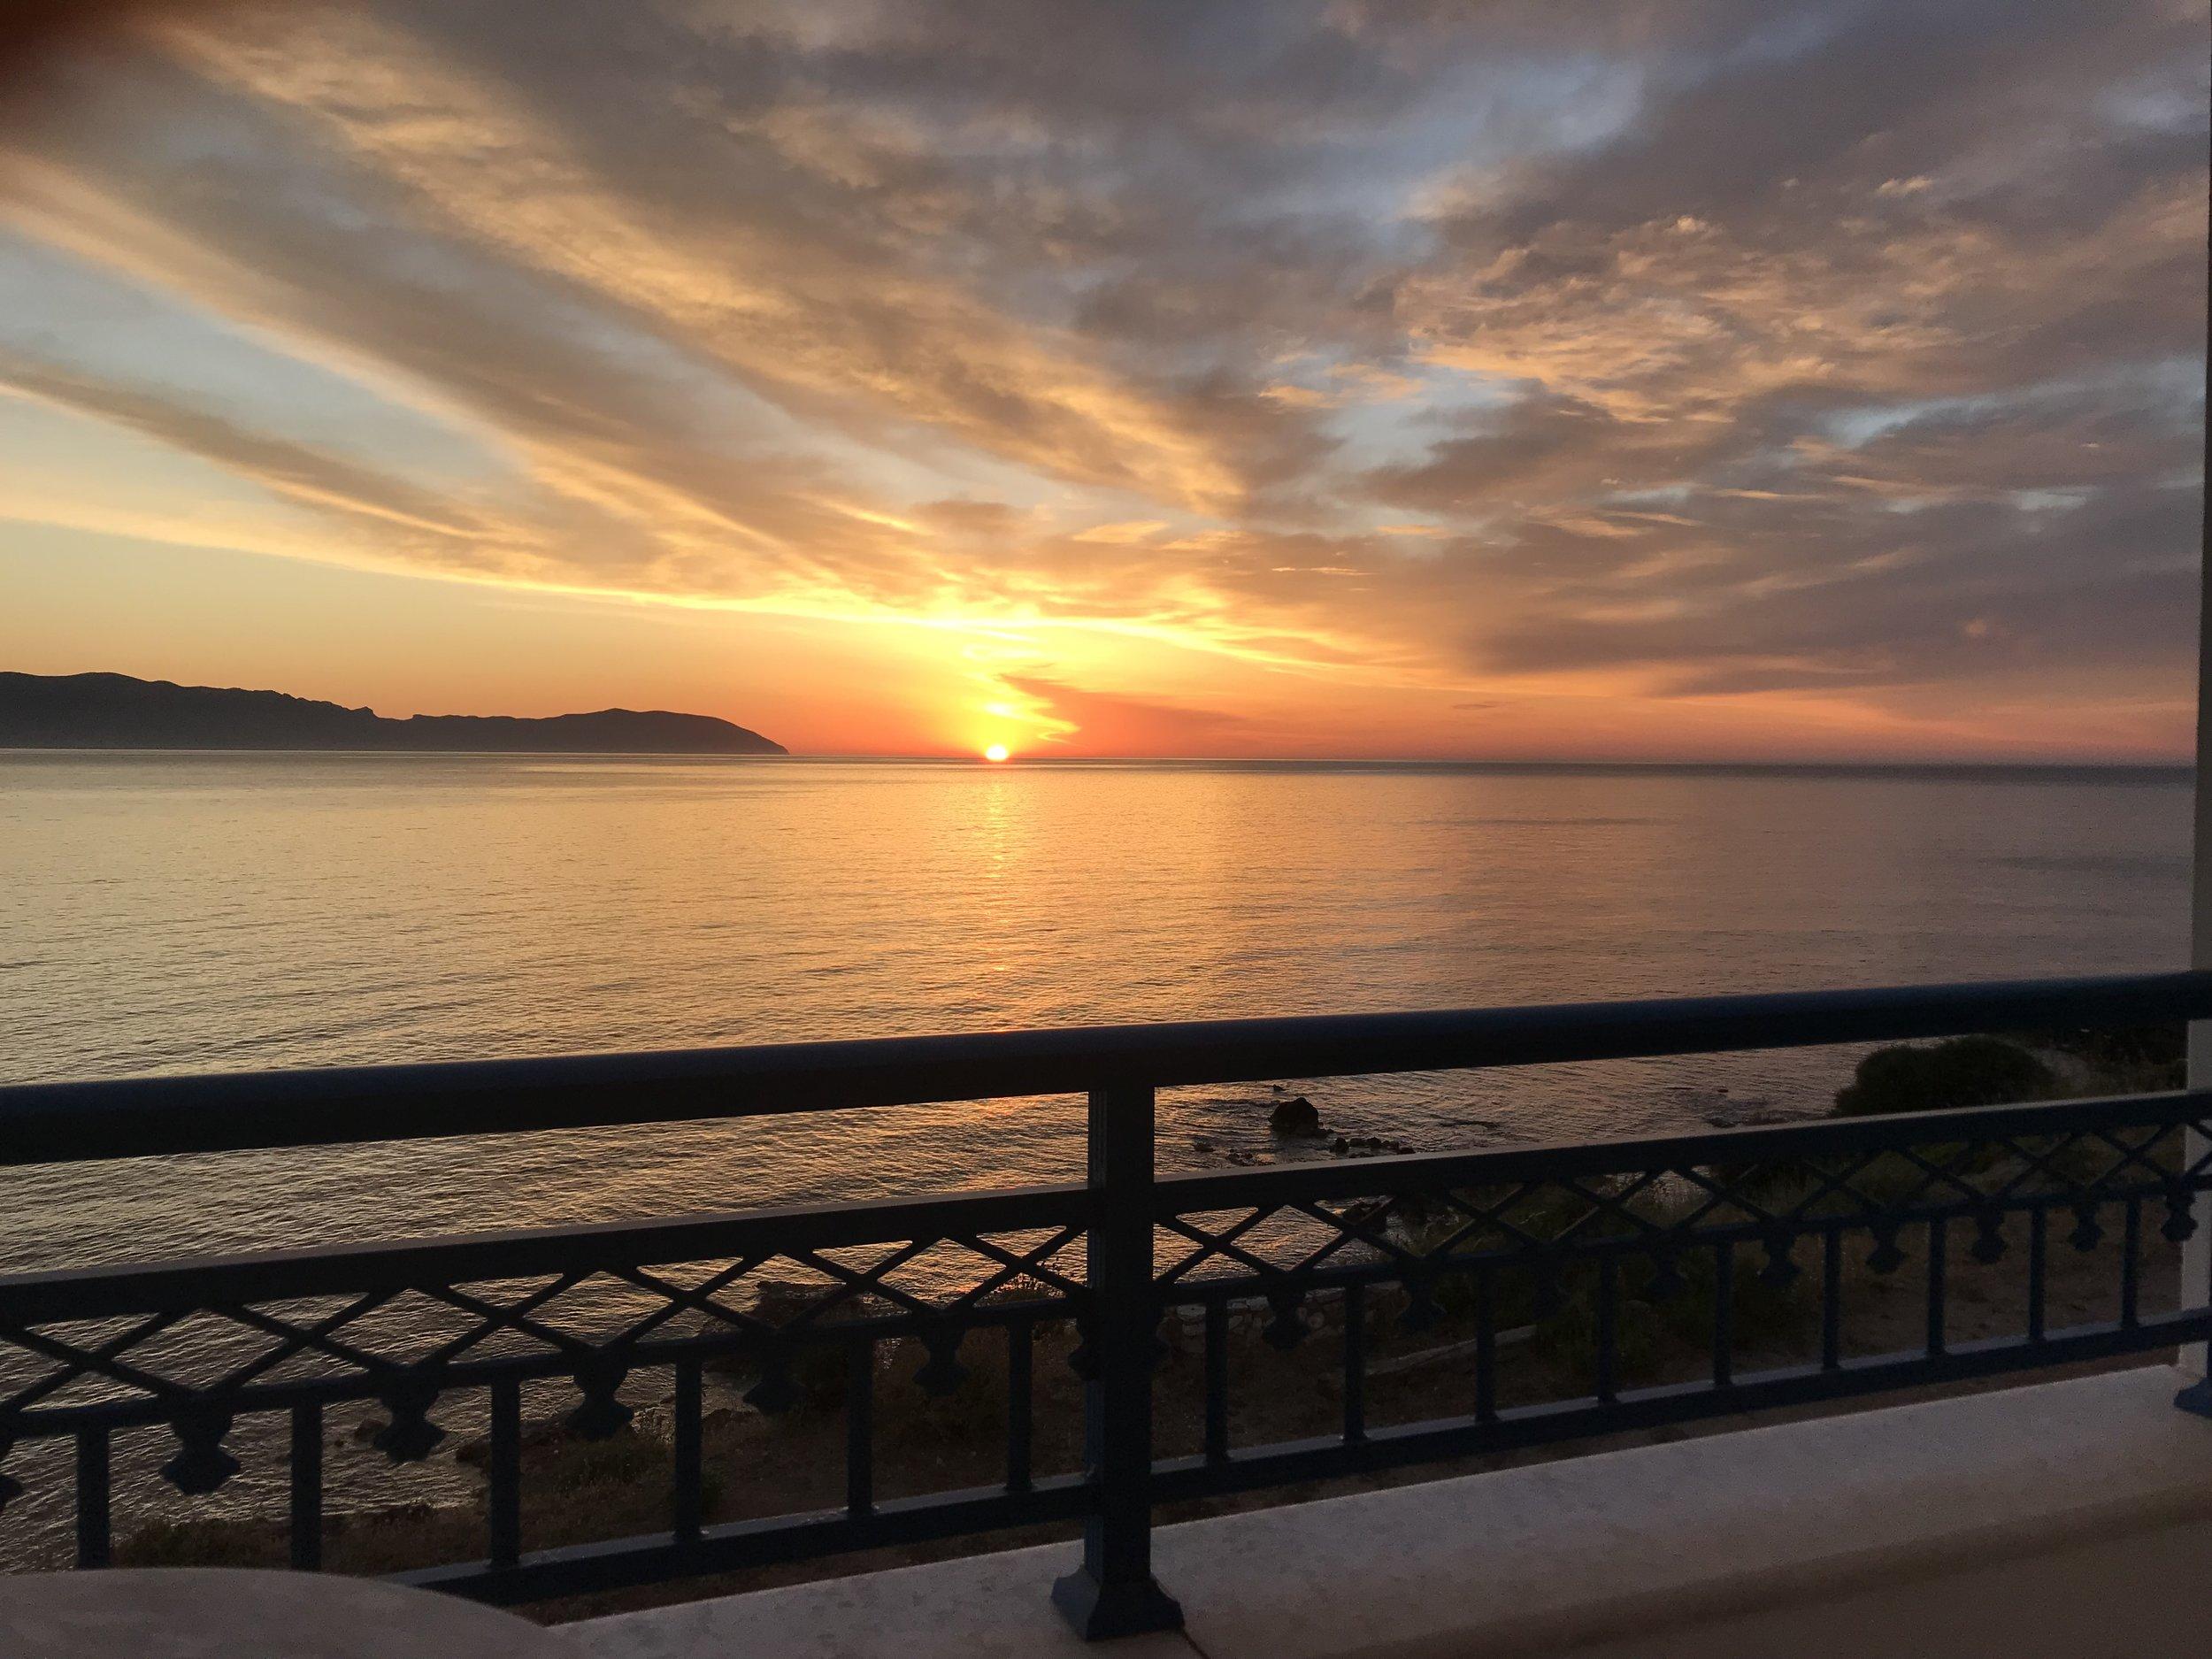 Sunrise from Hotel on Kythera